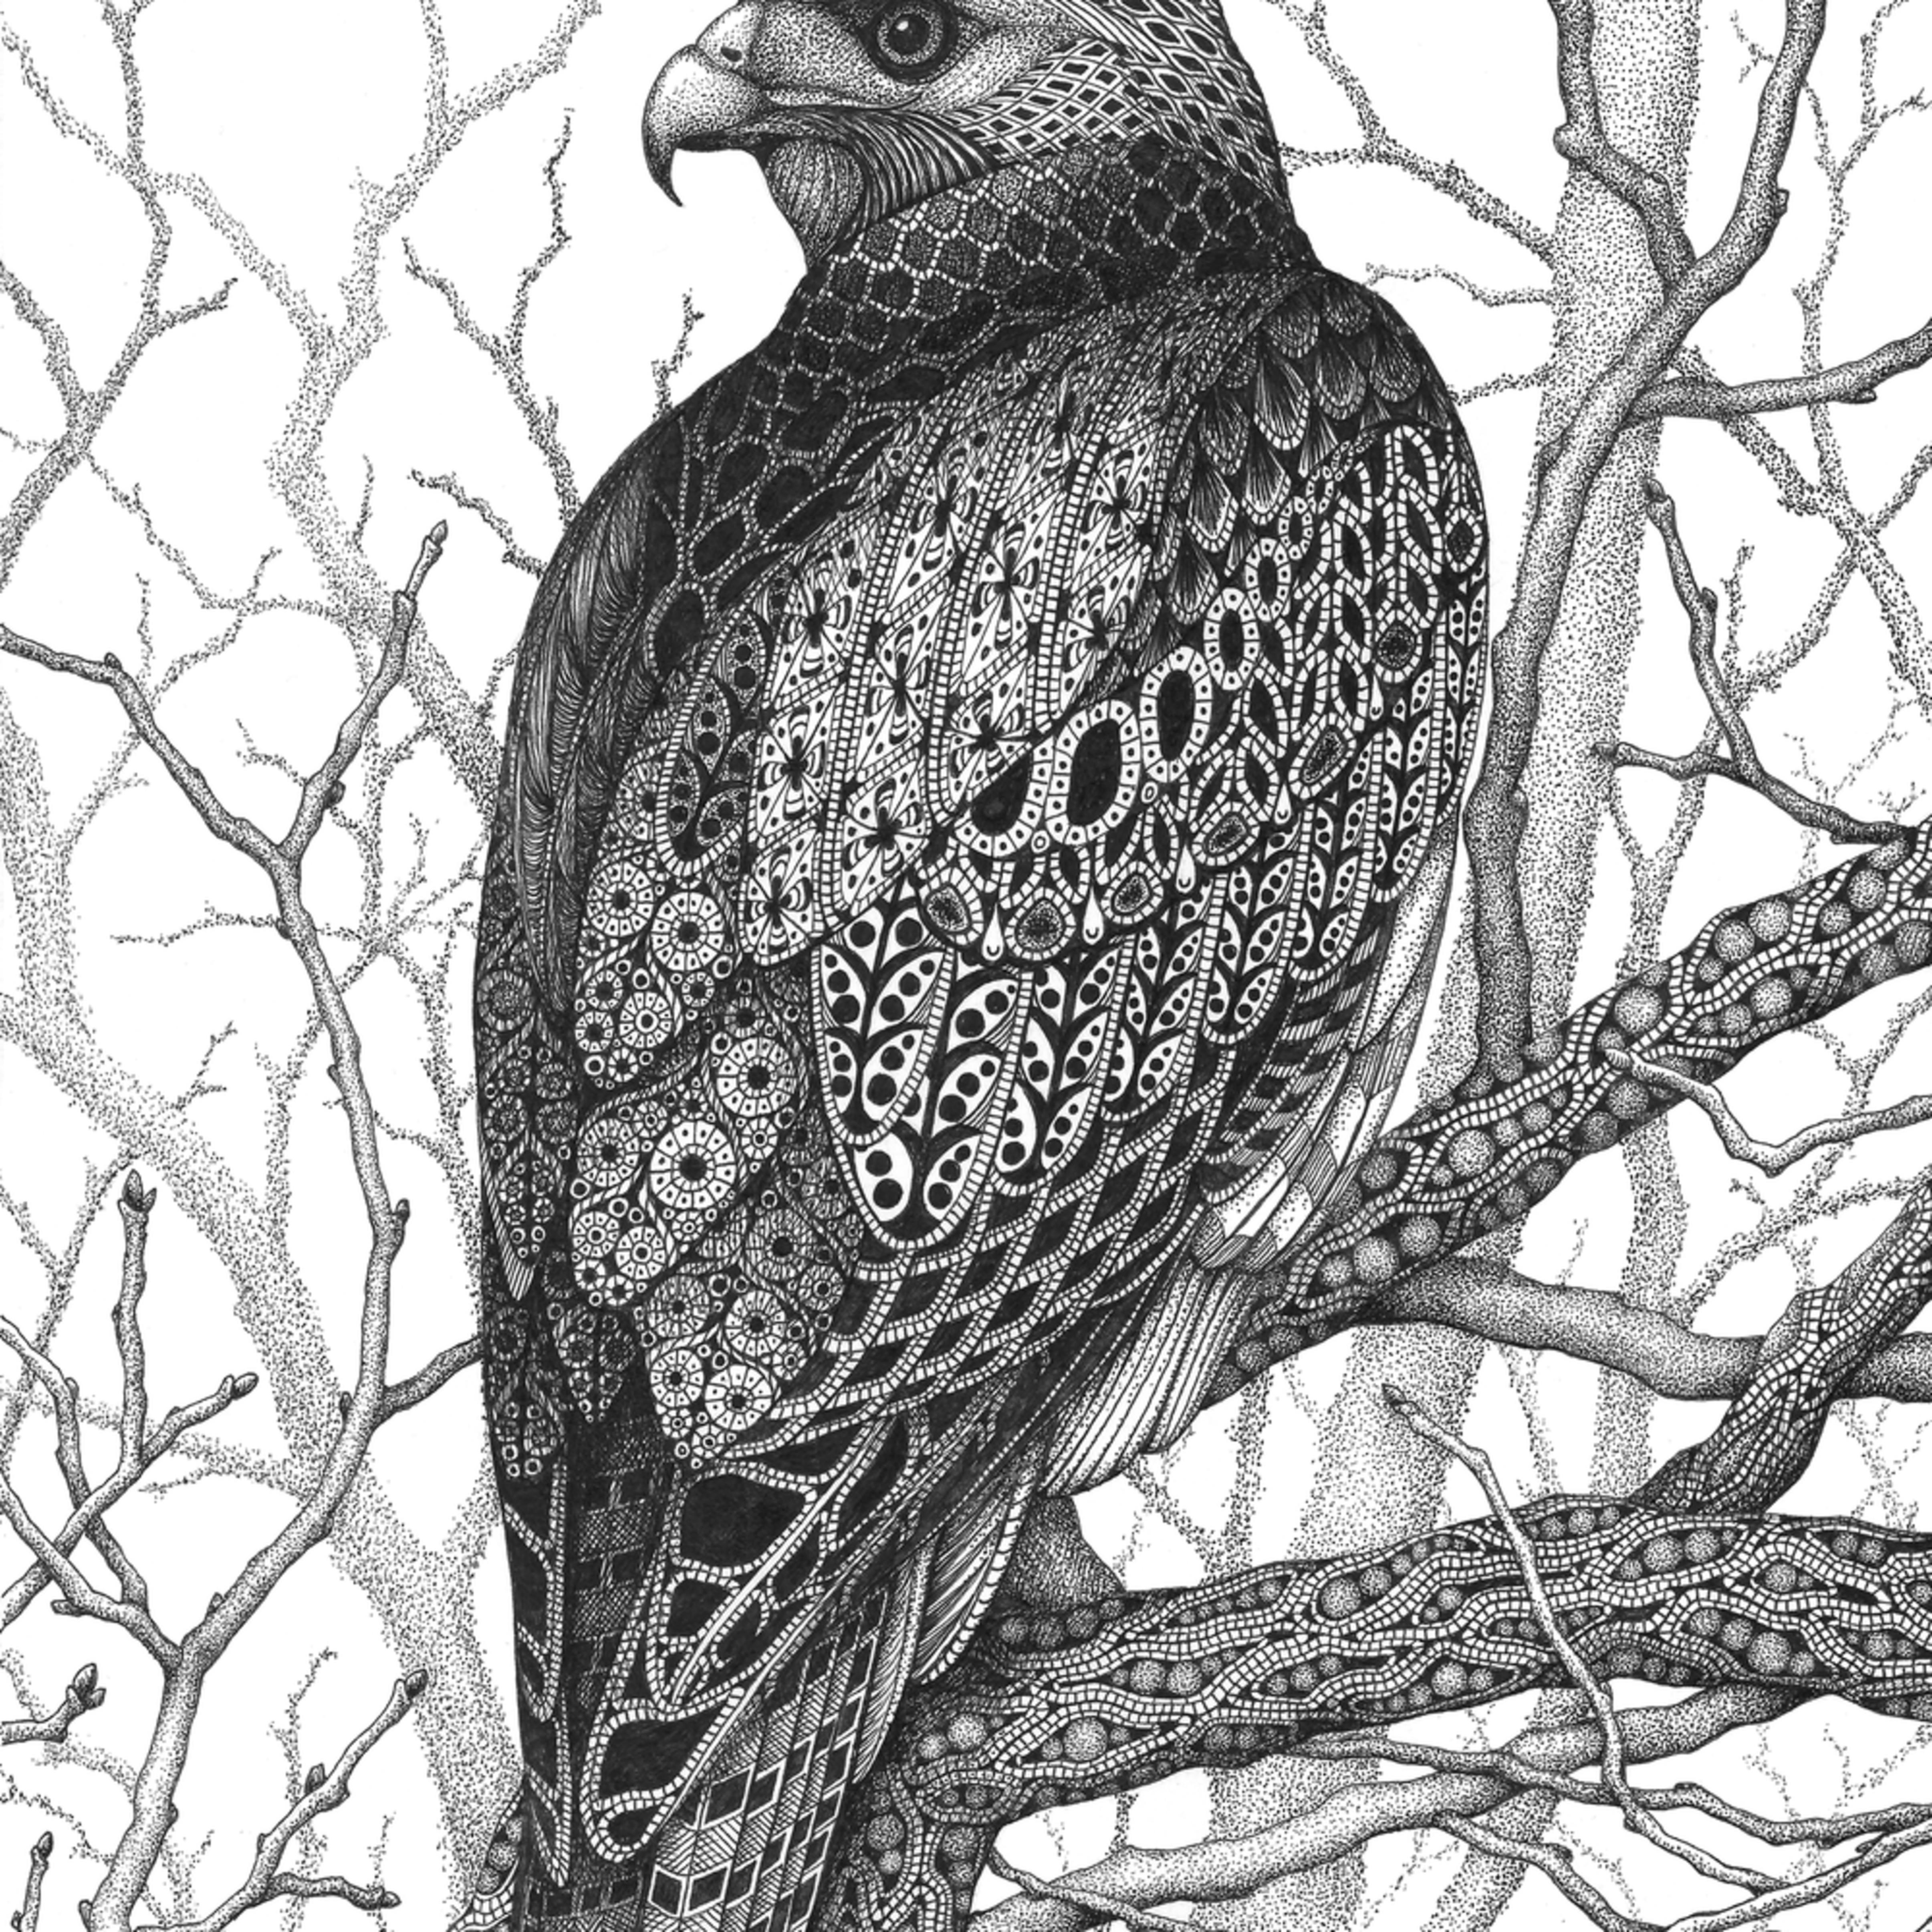 Watchful eye hawk nve45p